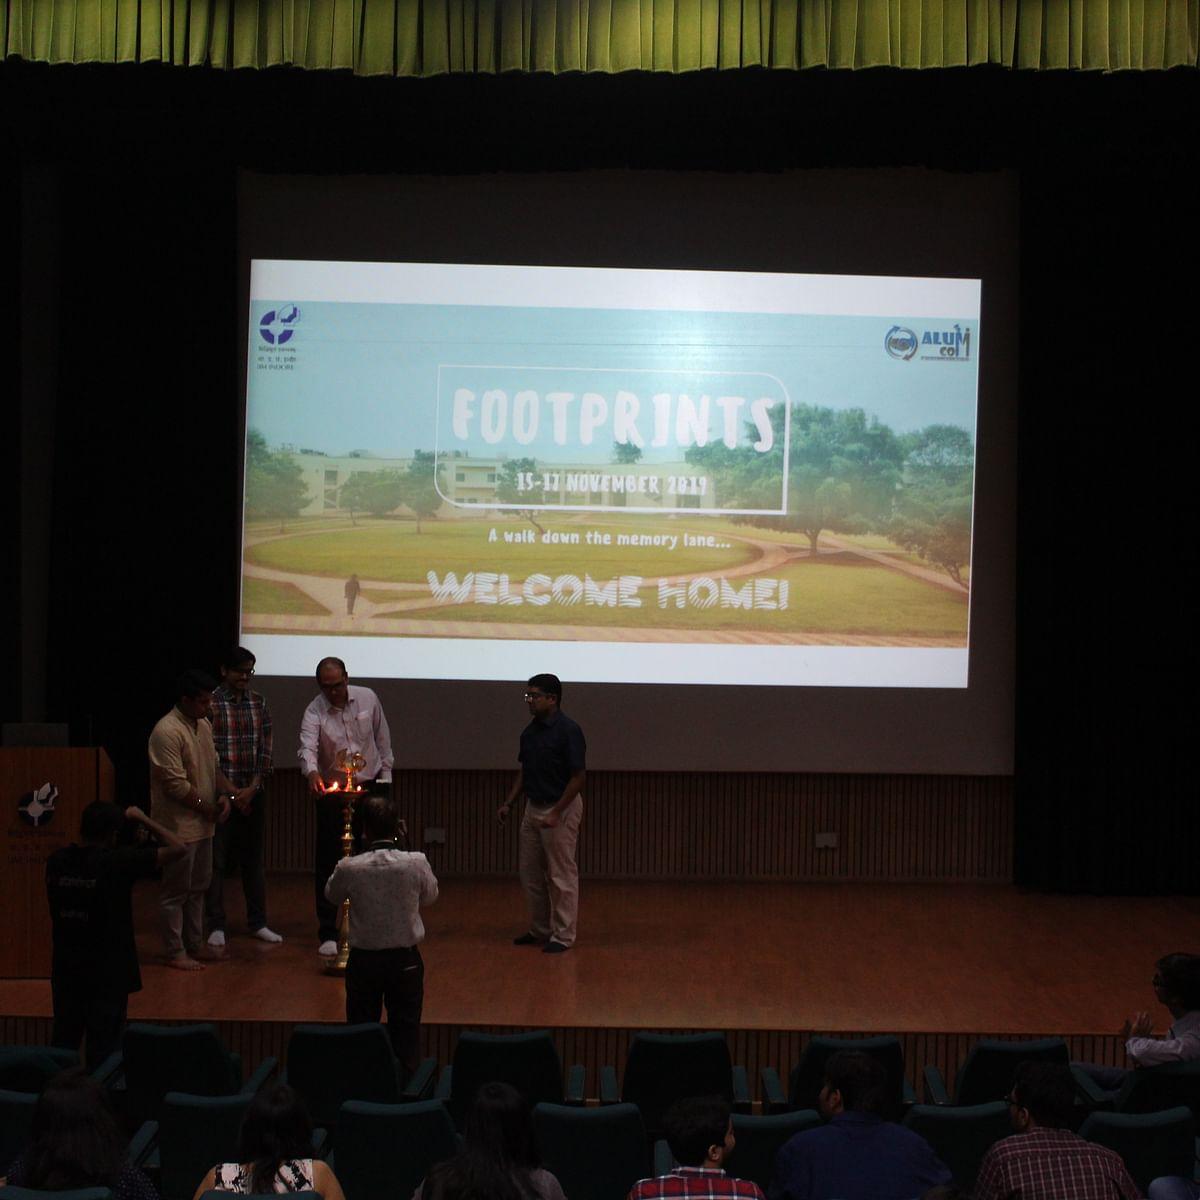 Indore: IIM-I Footprints 2019 inaugurated